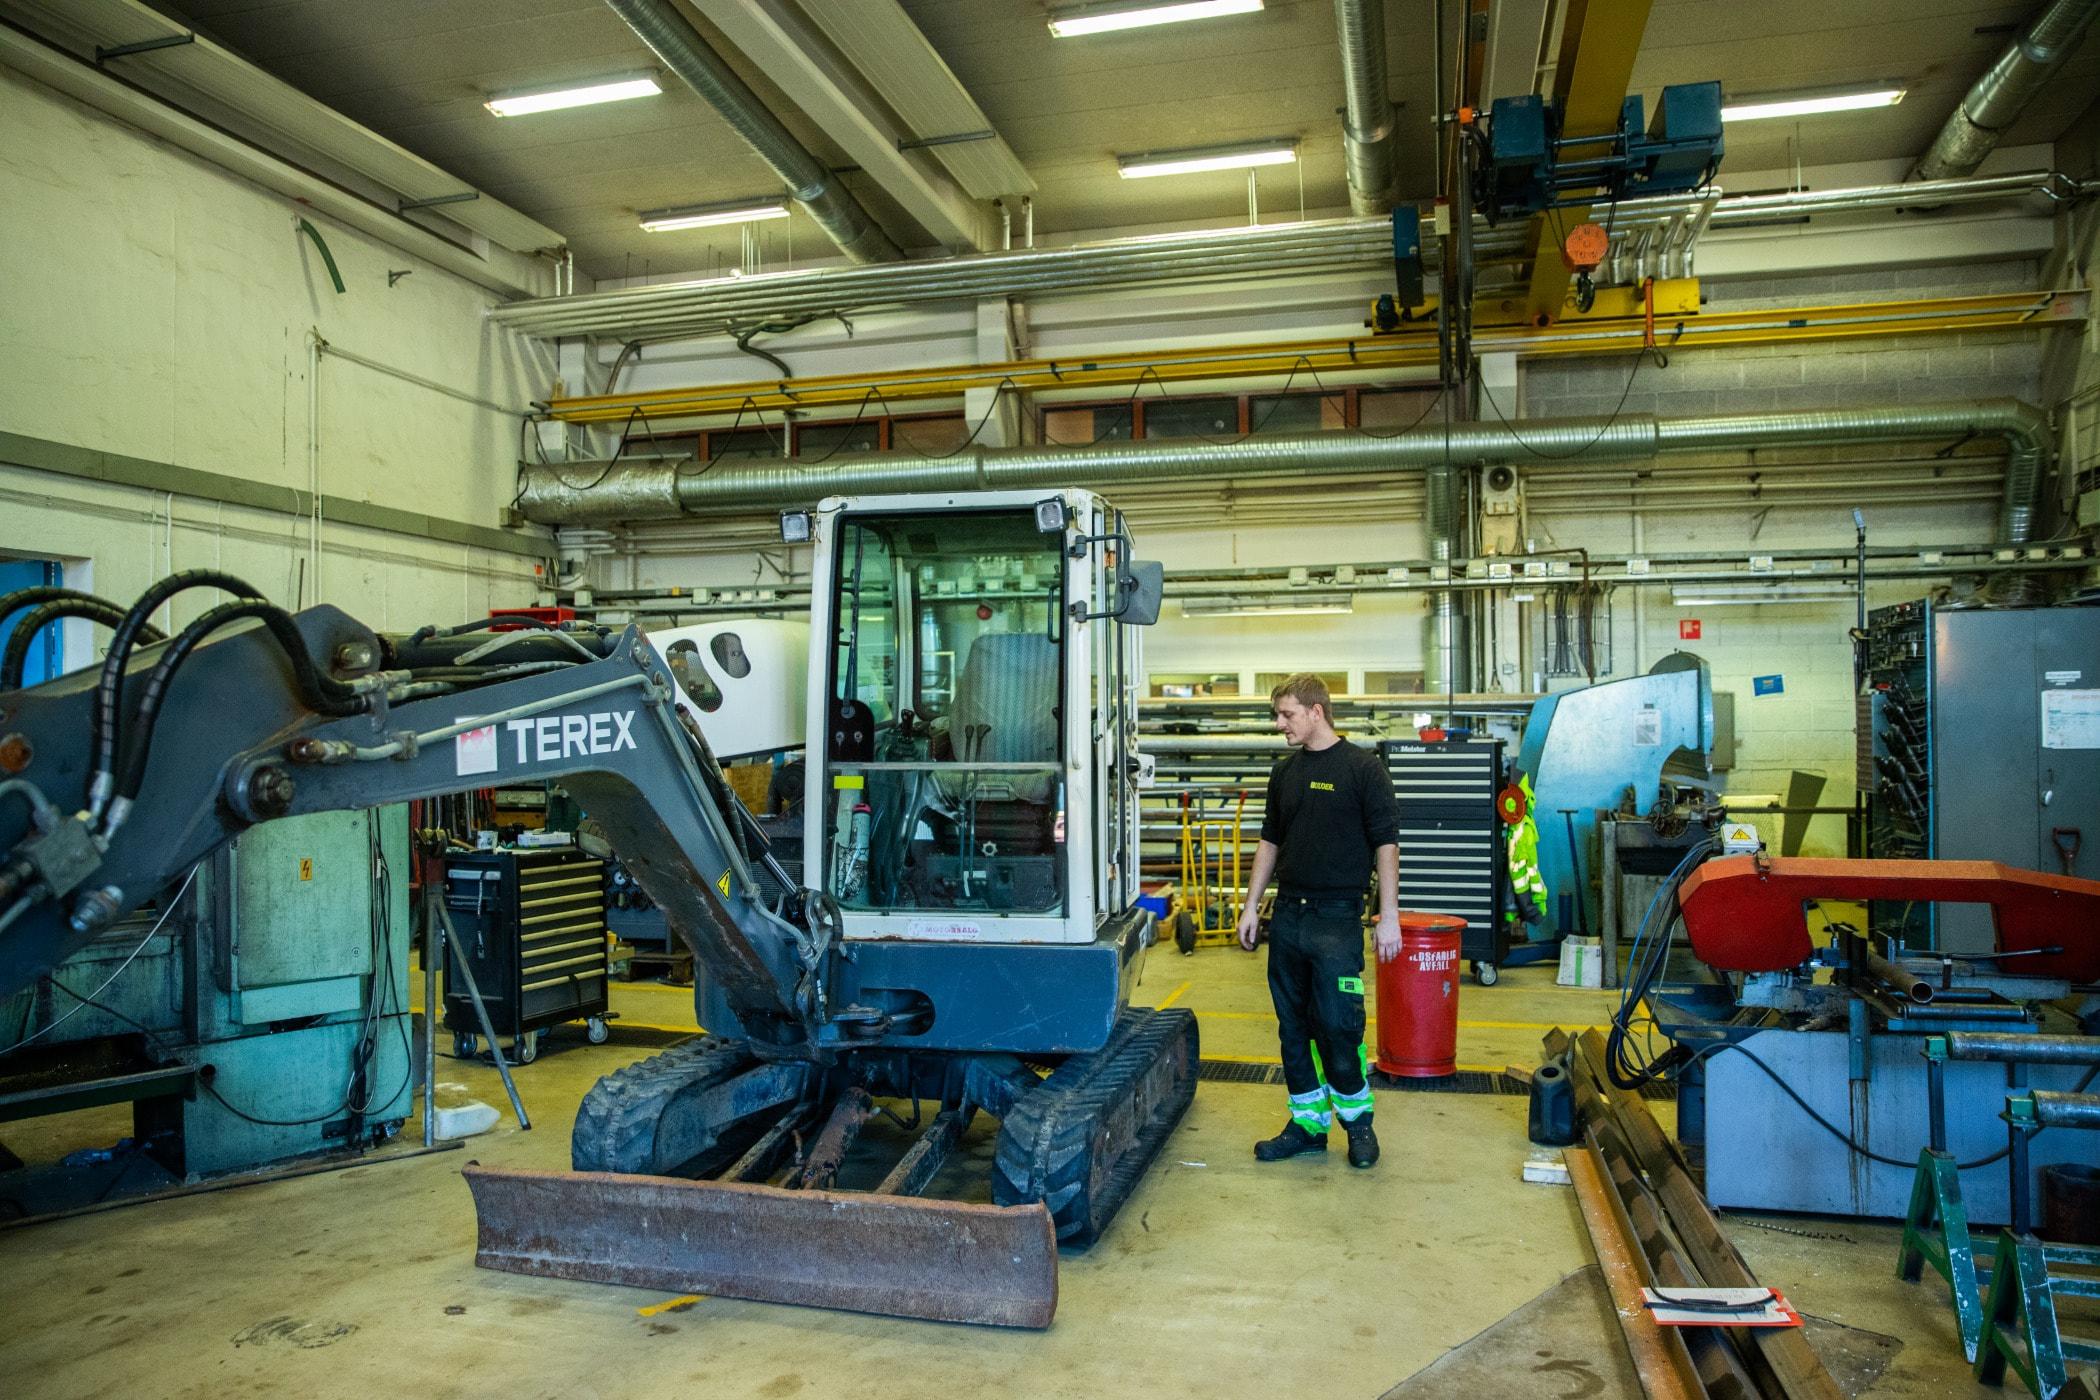 Toolroom, Factory, Machine, Industry